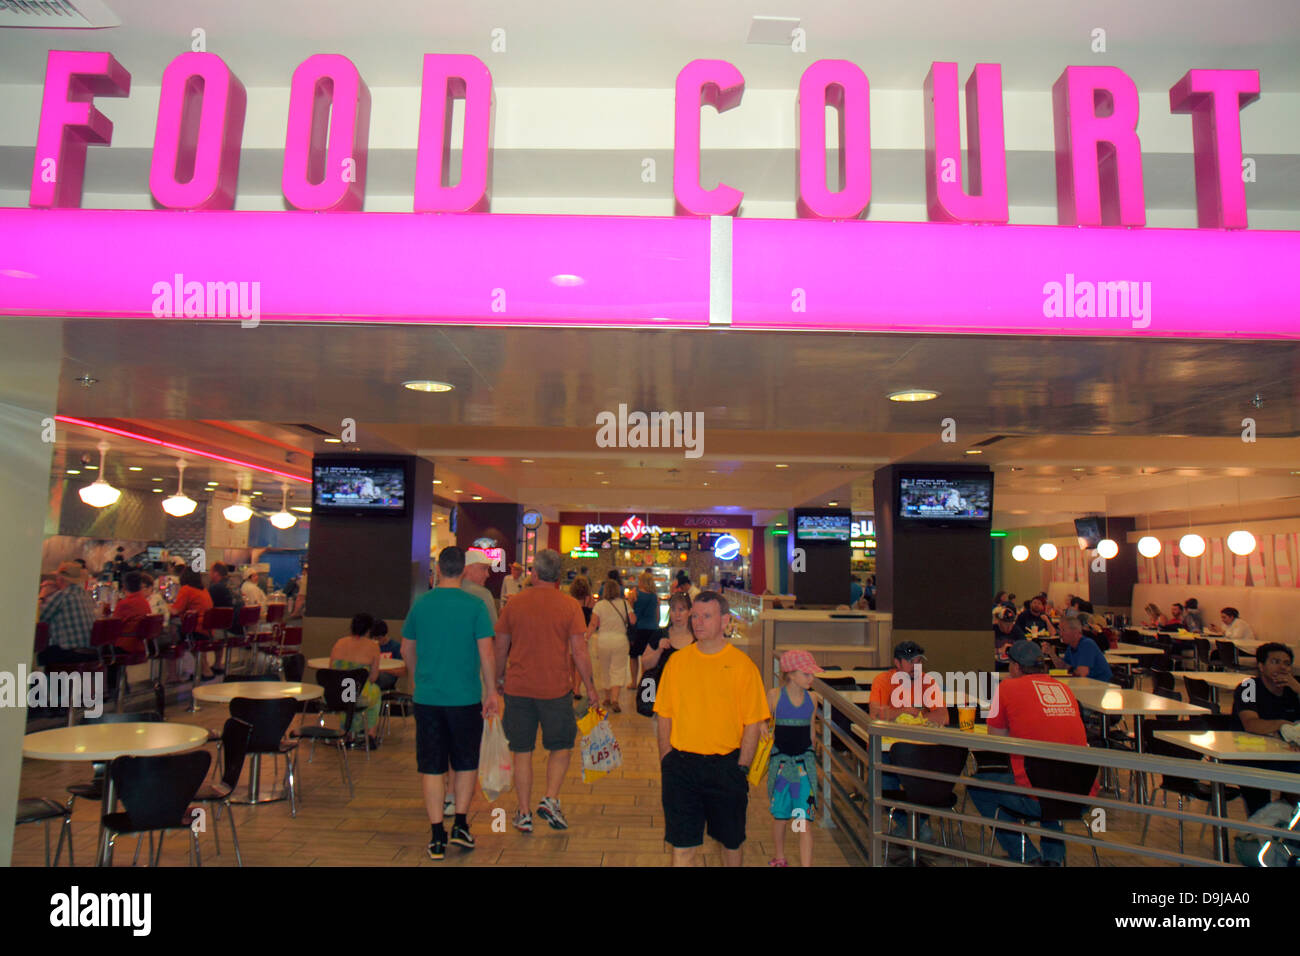 Fast food restaurant search strip